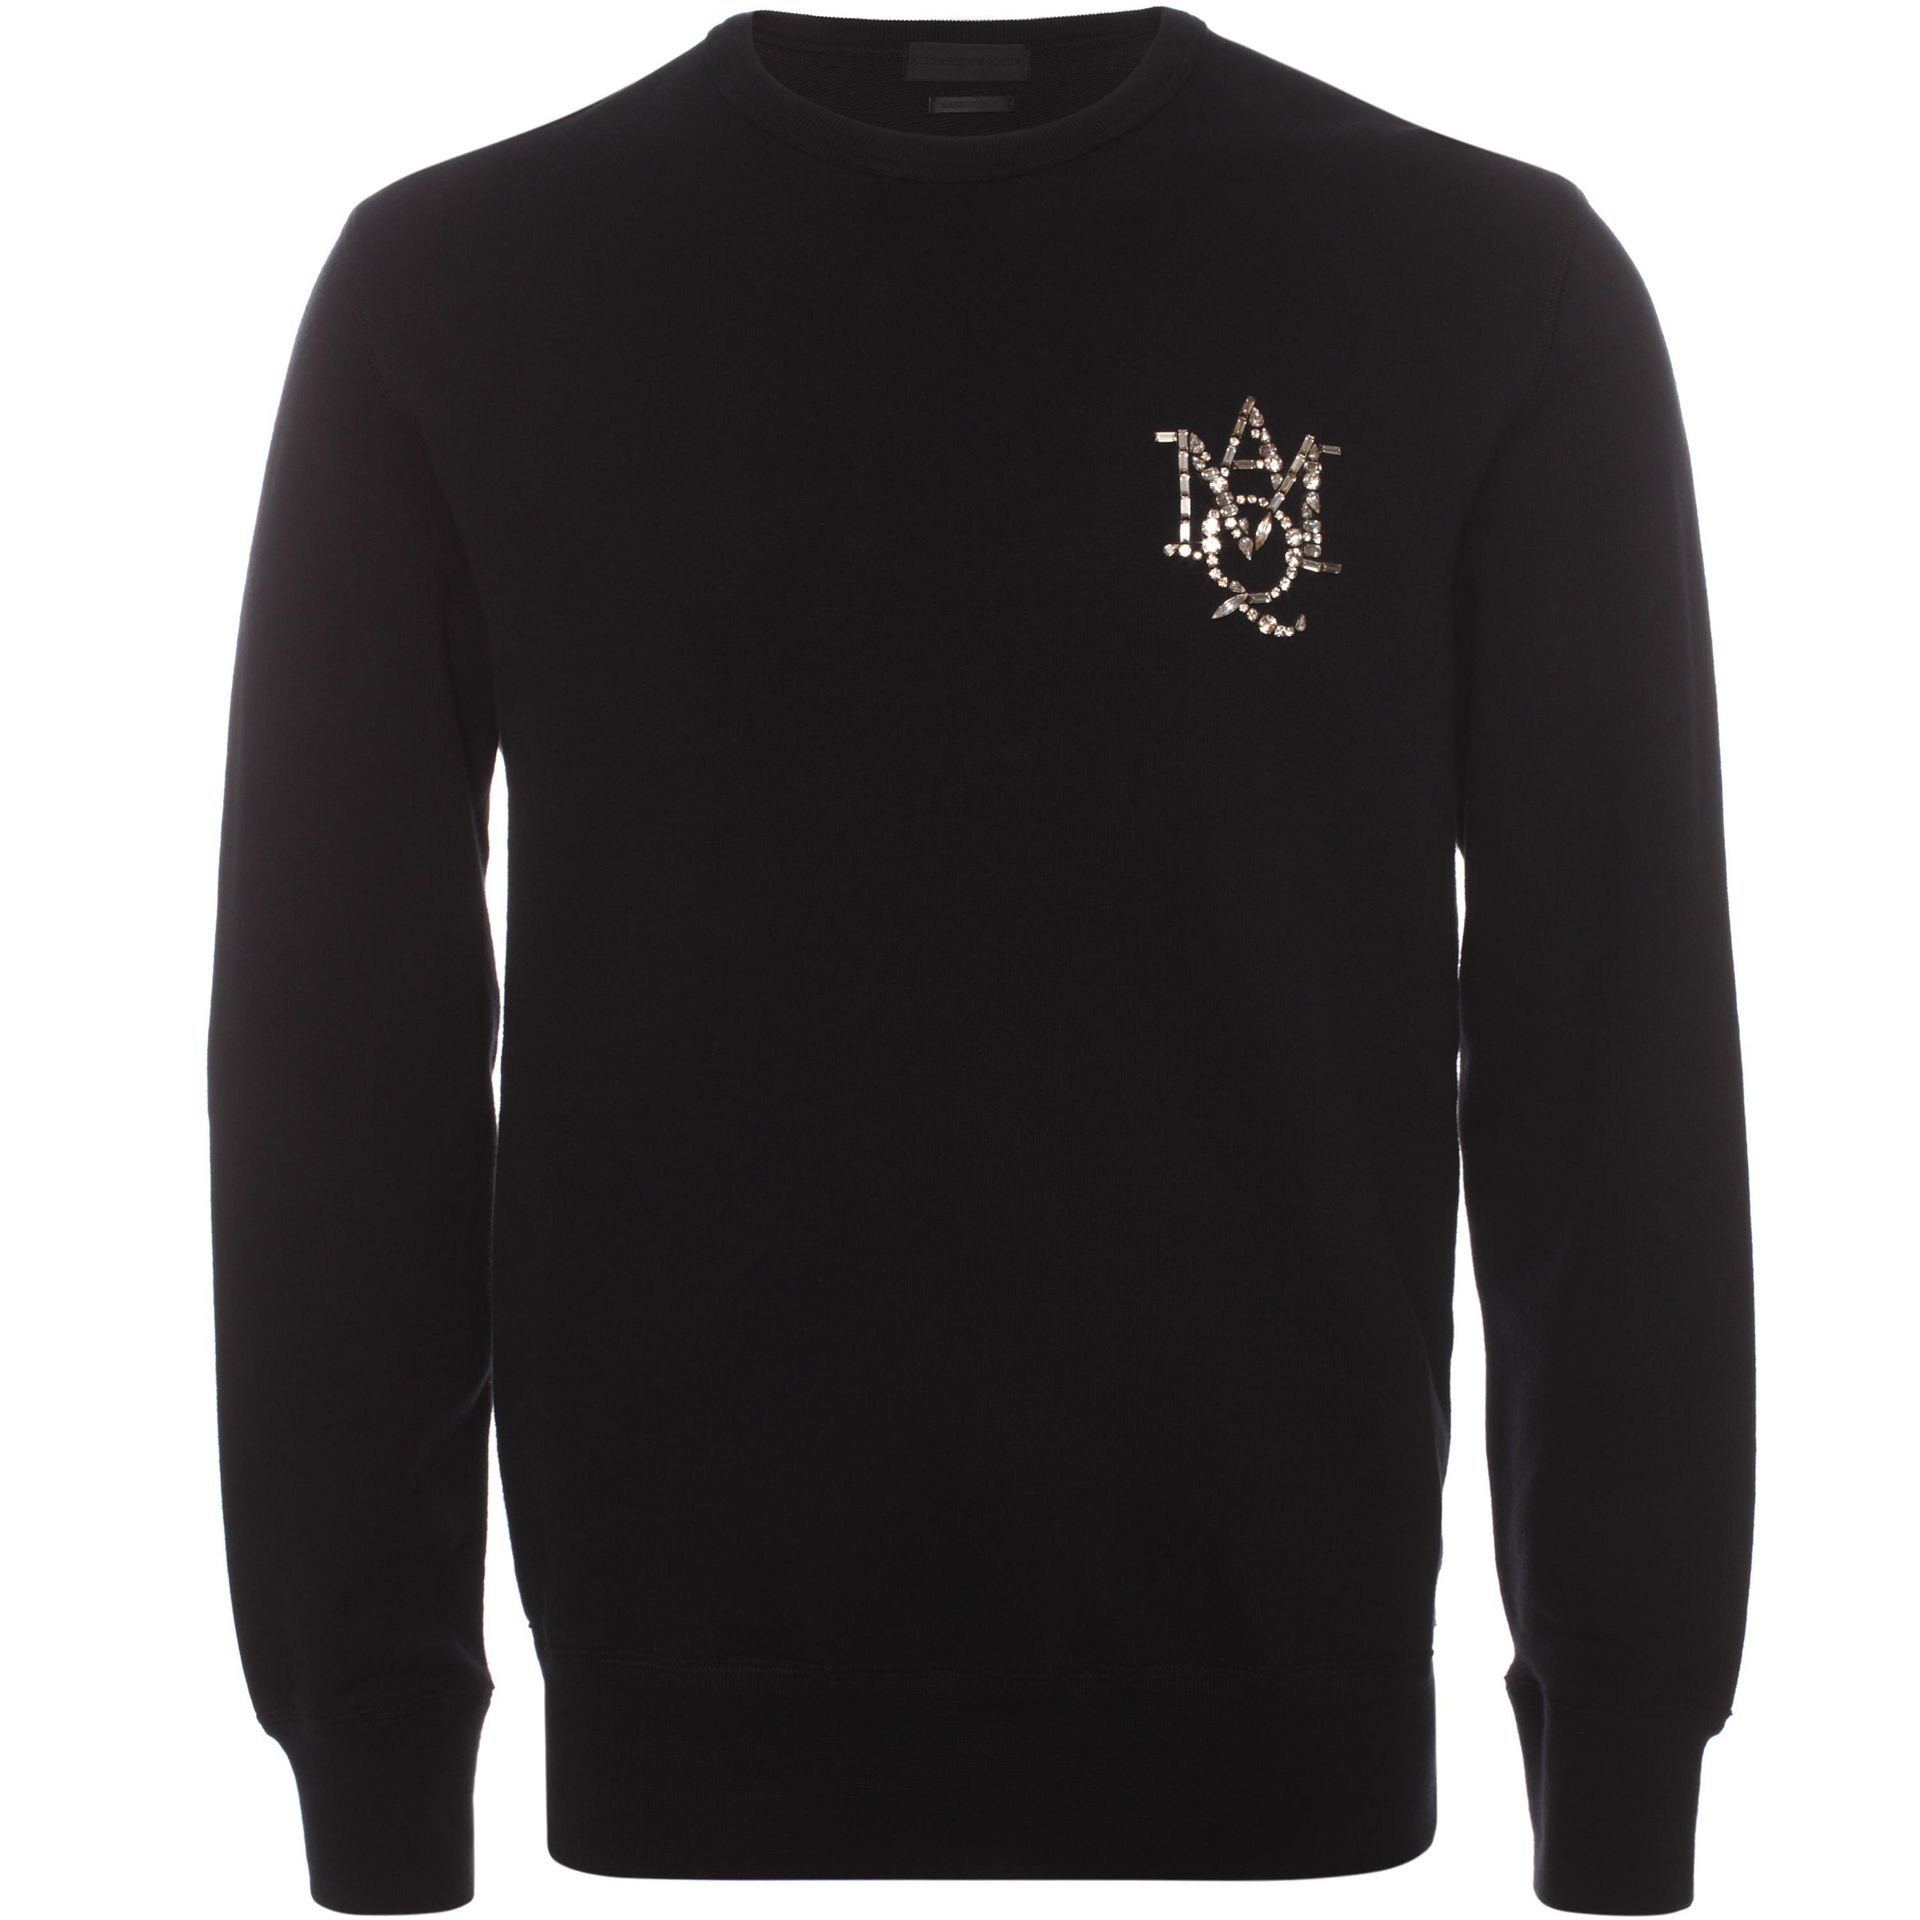 alexander mcqueen amq crystal embroidered sweatshirt in black for men lyst. Black Bedroom Furniture Sets. Home Design Ideas